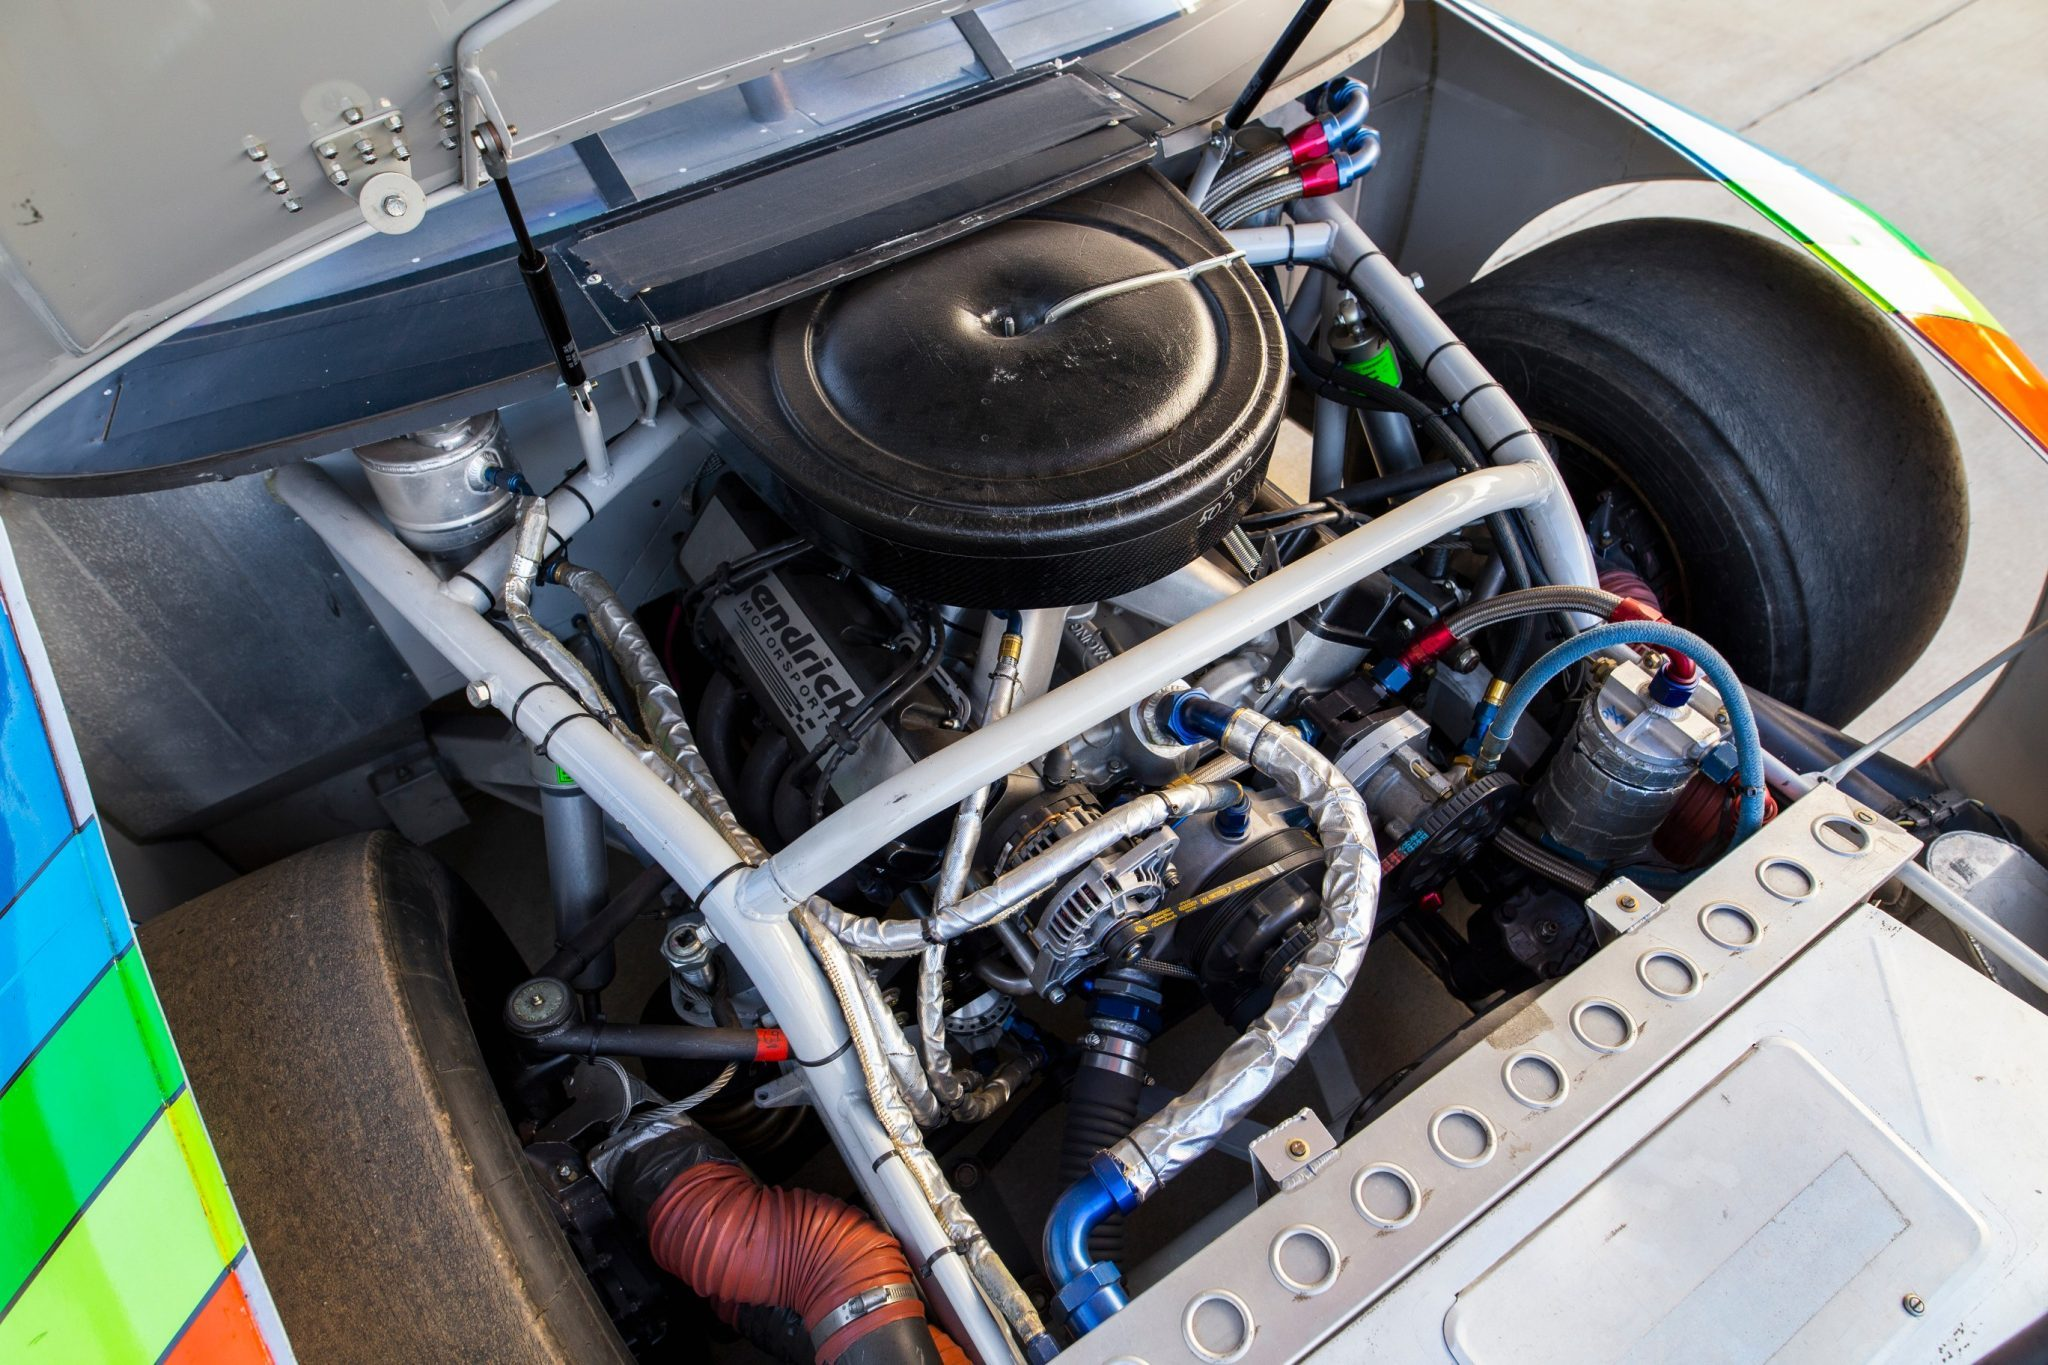 NASCAR engine - Jeff Gordon 1997